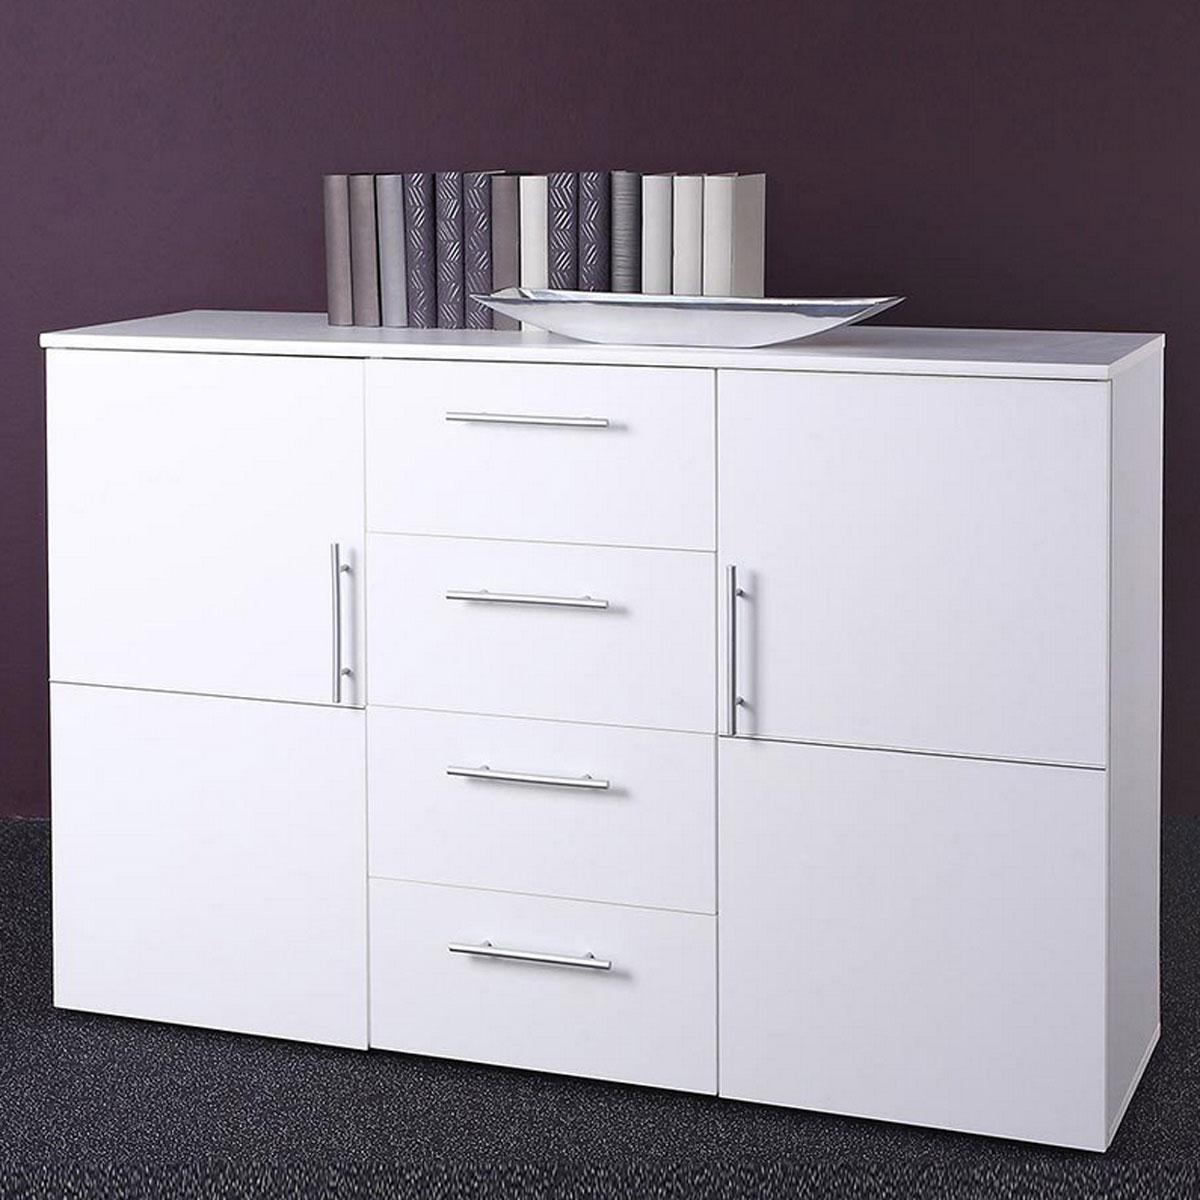 sideboard punto 4 kommode wei 2 t ren 4 schubk sten ebay. Black Bedroom Furniture Sets. Home Design Ideas